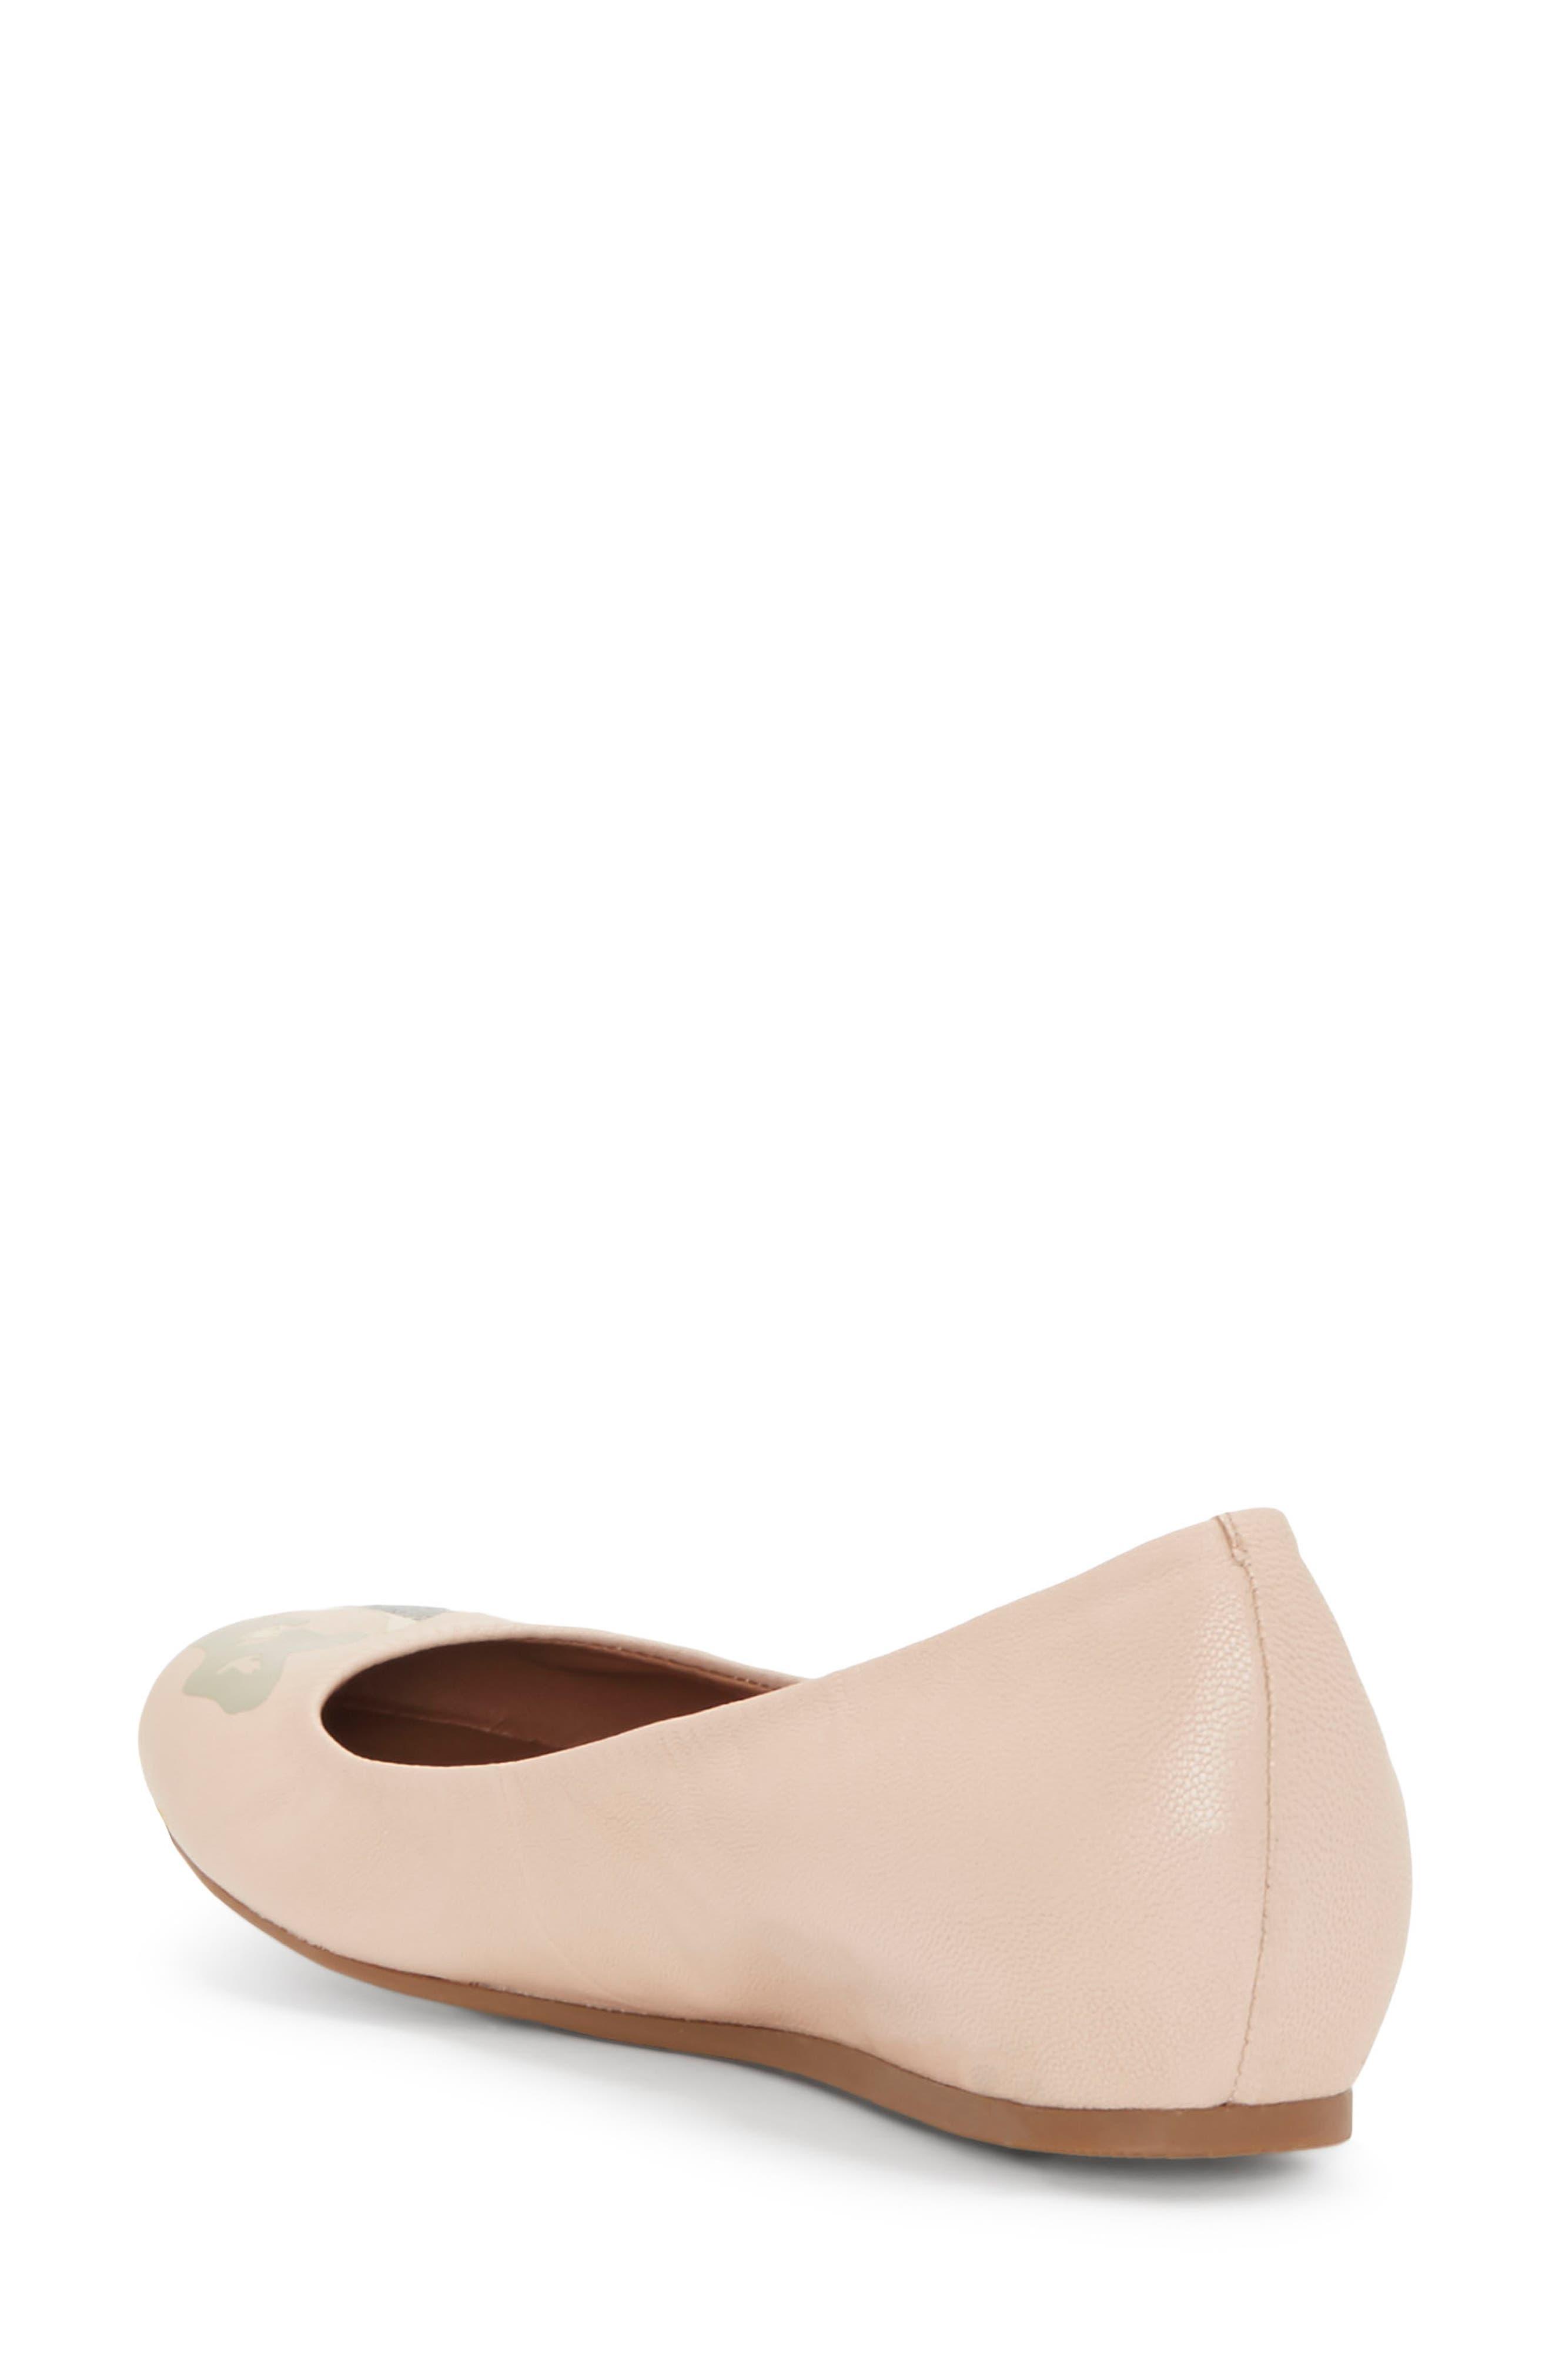 'Langston' Ballet Flat,                             Alternate thumbnail 3, color,                             Misty Rose Leather